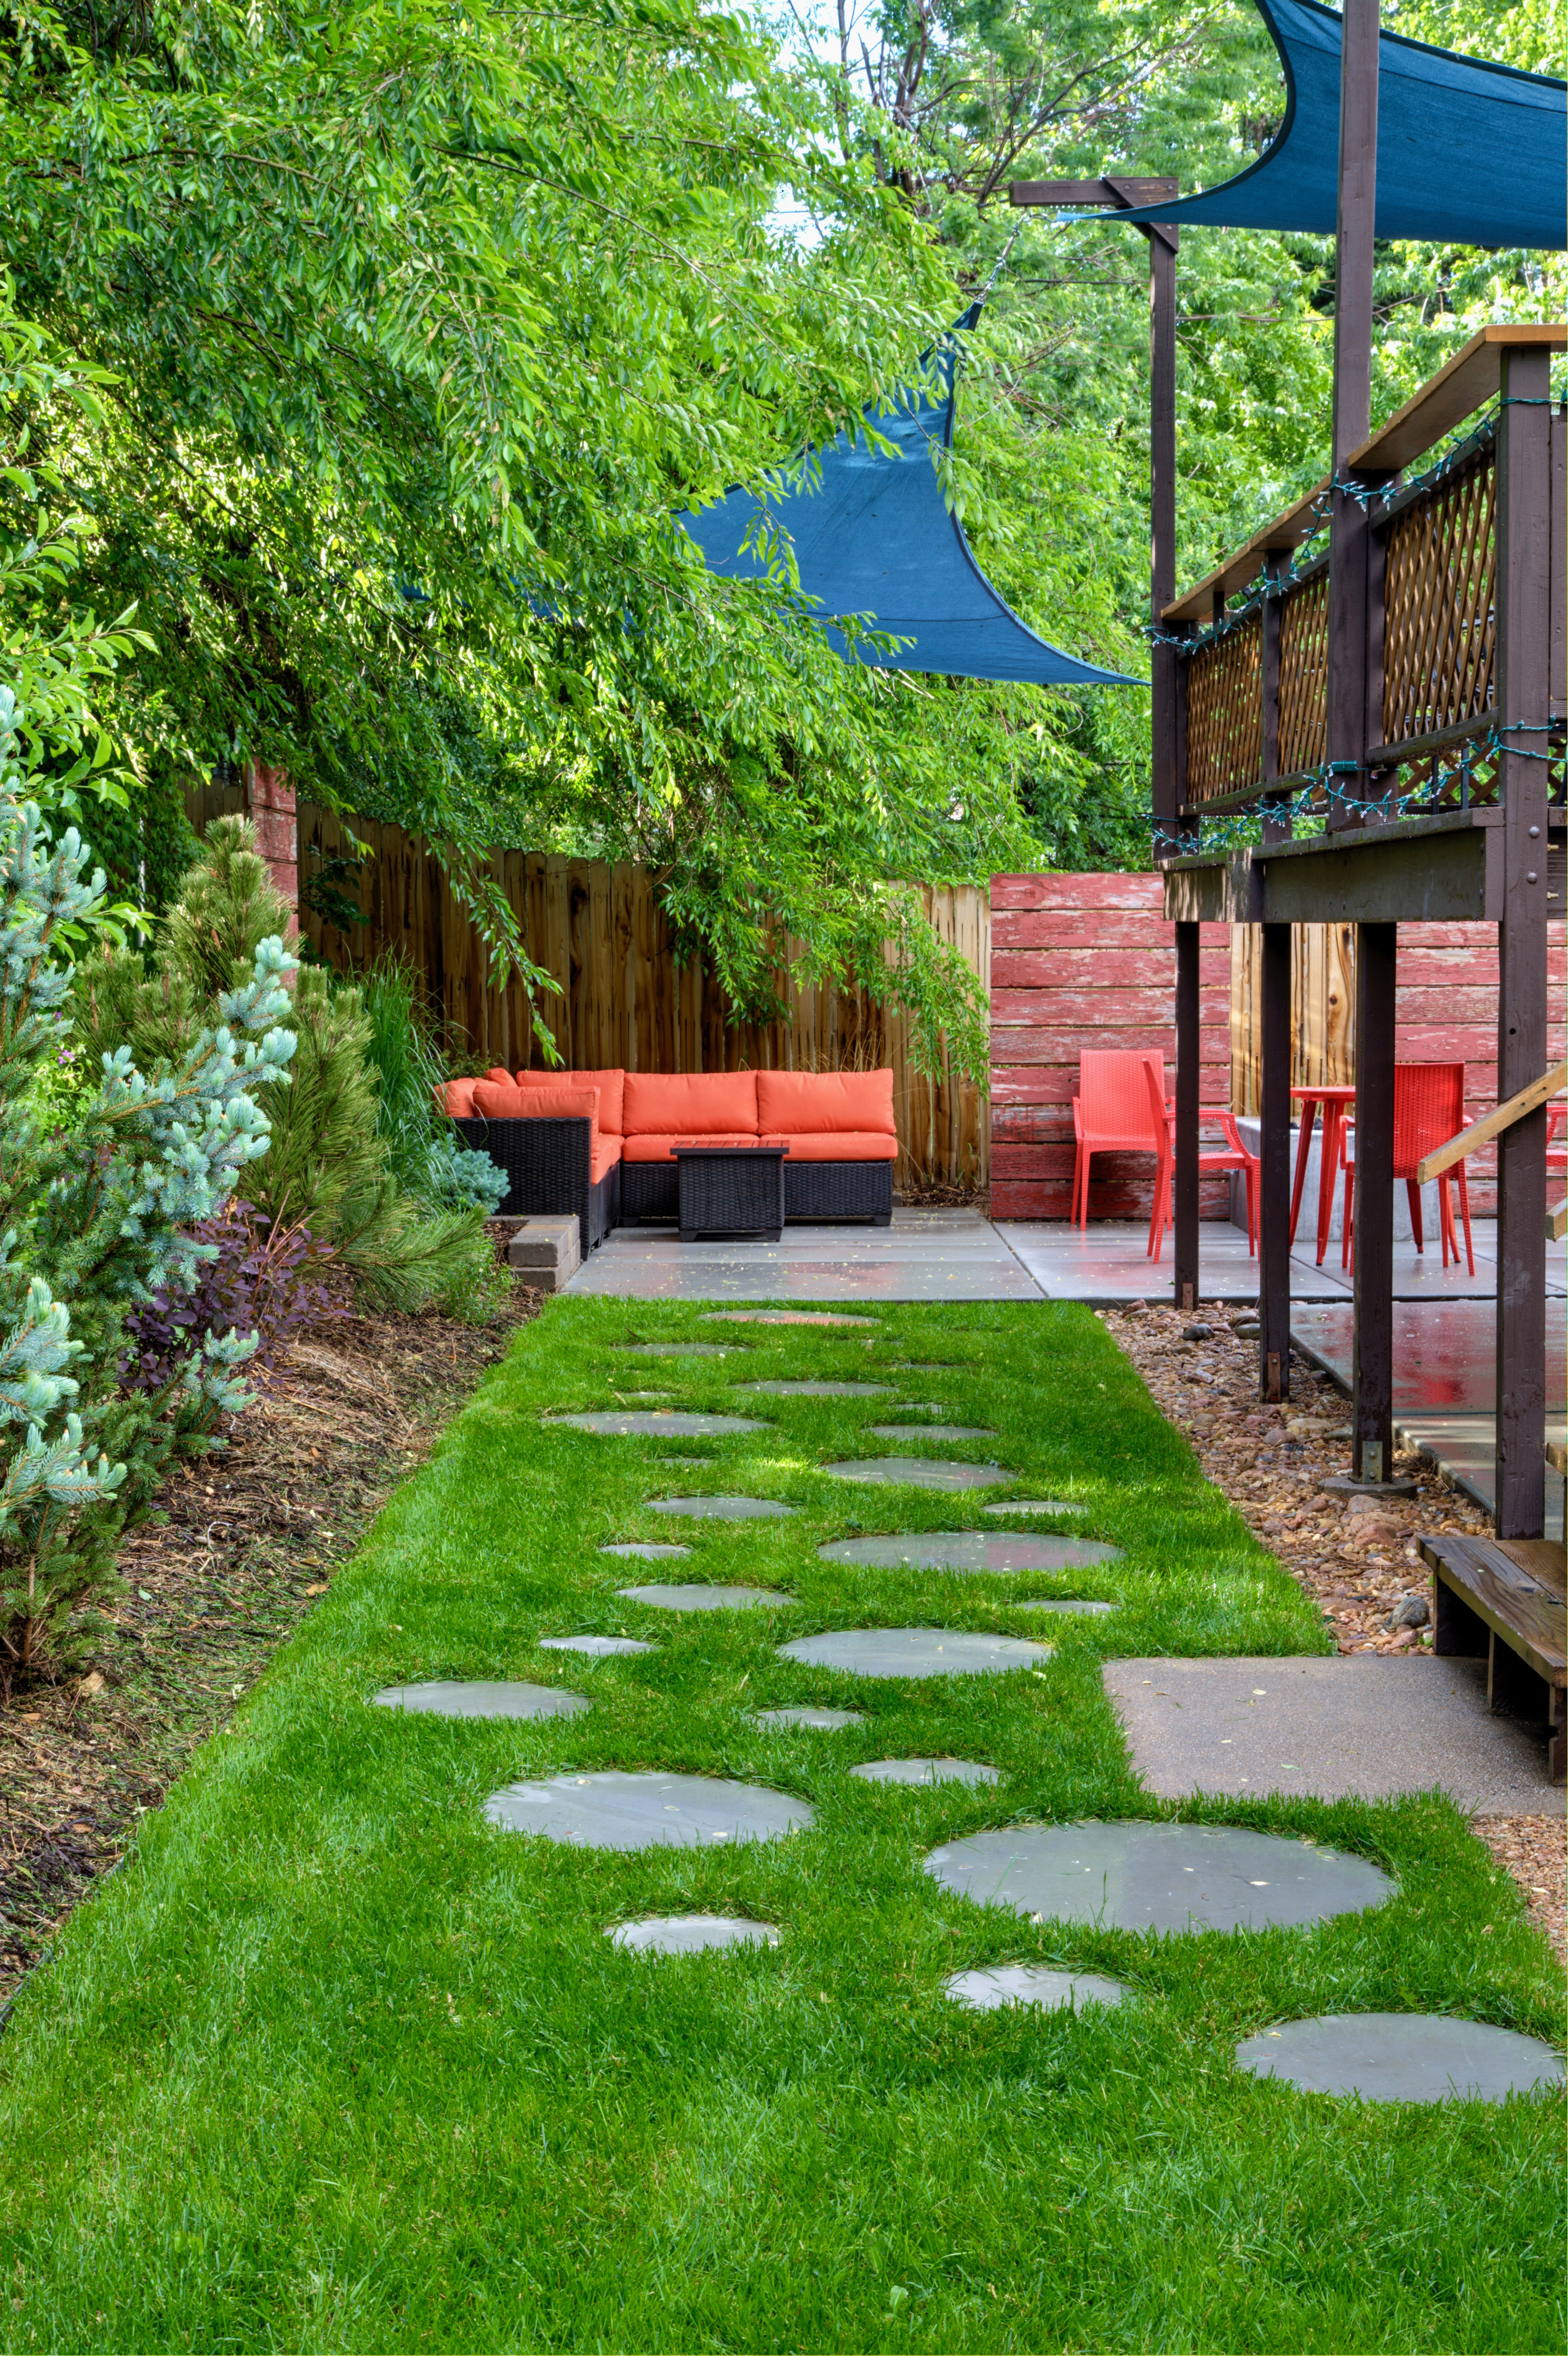 How To Keep Bugs Away From Patio Bug Free Backyard Houselogic